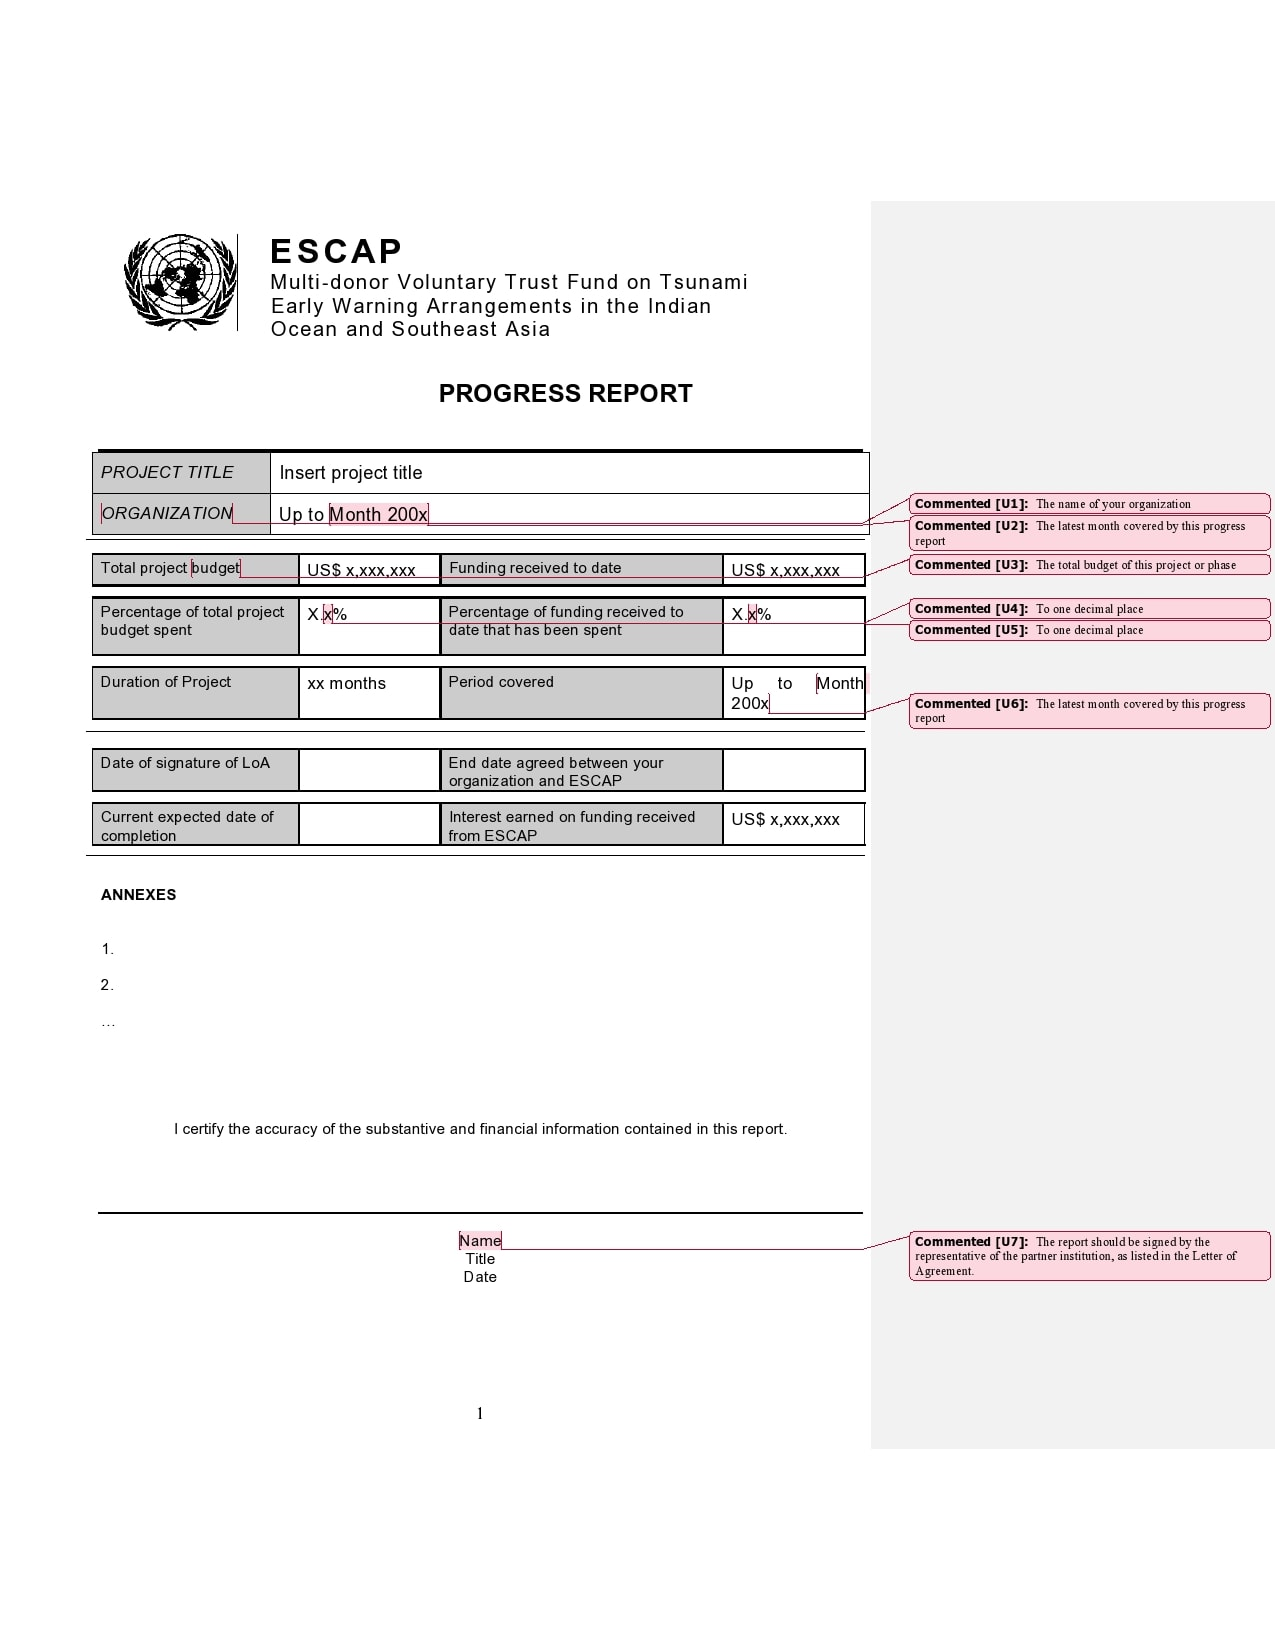 50 Professional Progress Report Templates Free Templatearchive